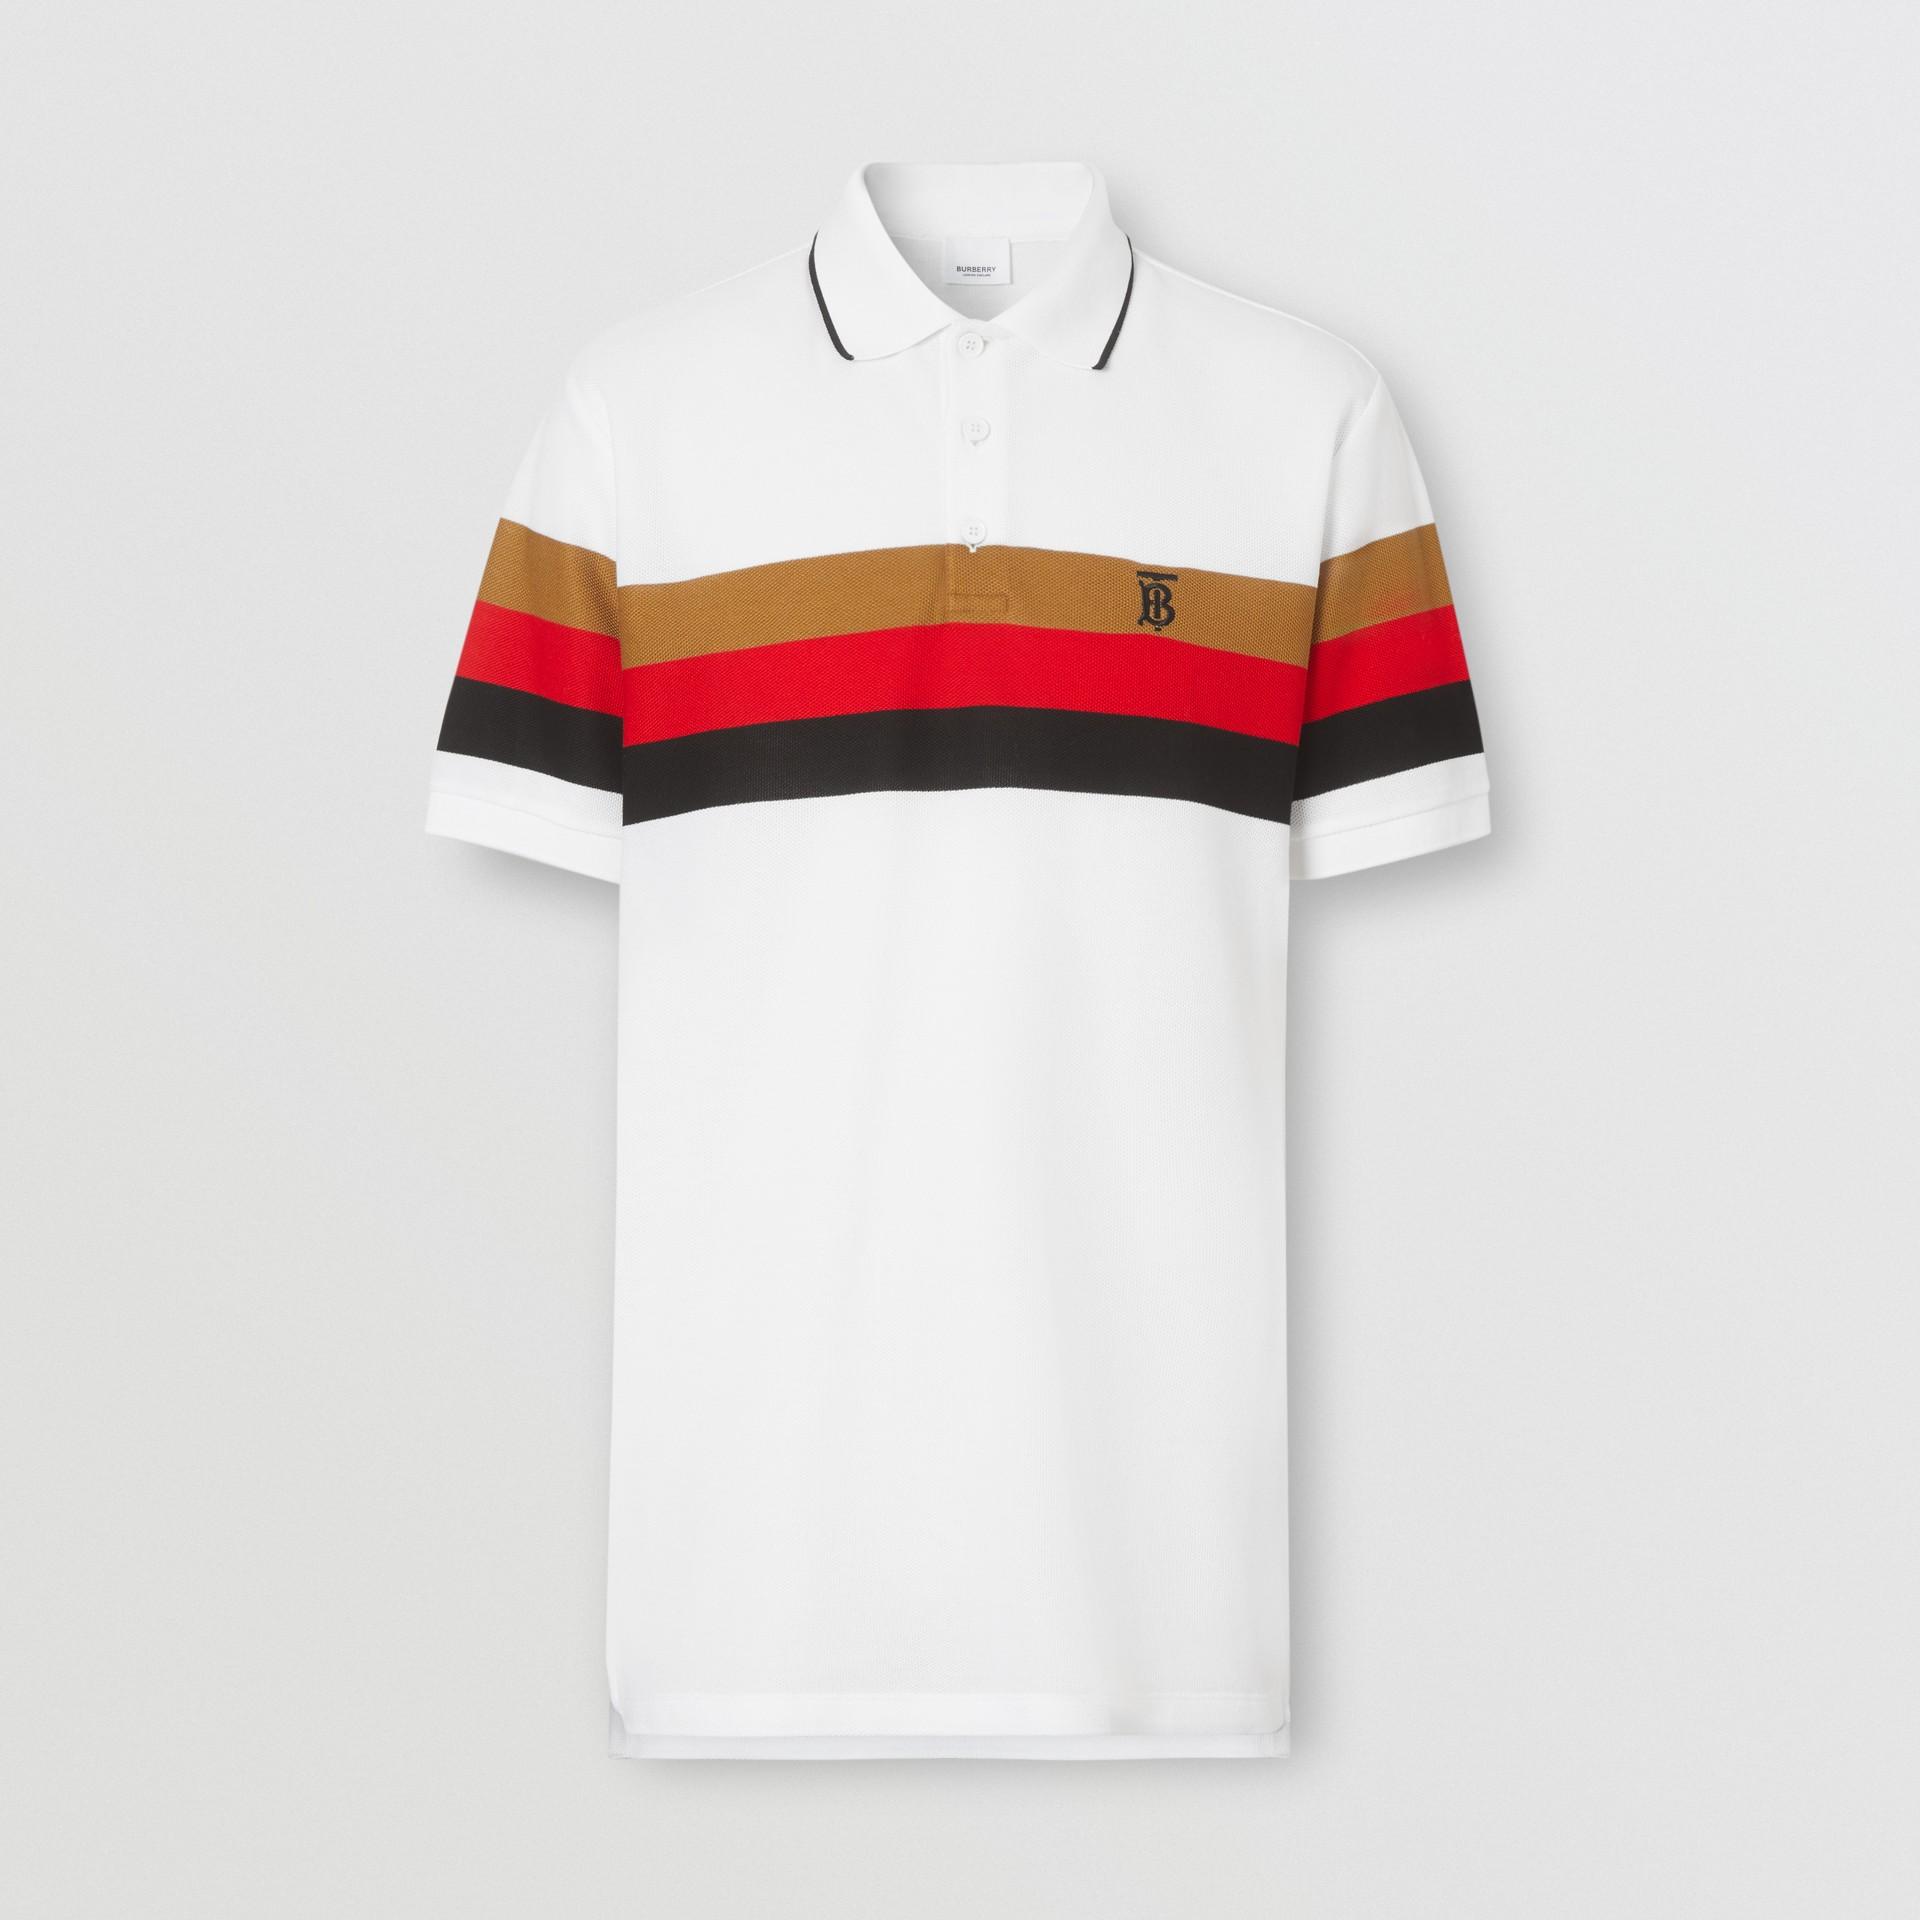 Monogram Motif Striped Cotton Polo Shirt in White - Men | Burberry - gallery image 3